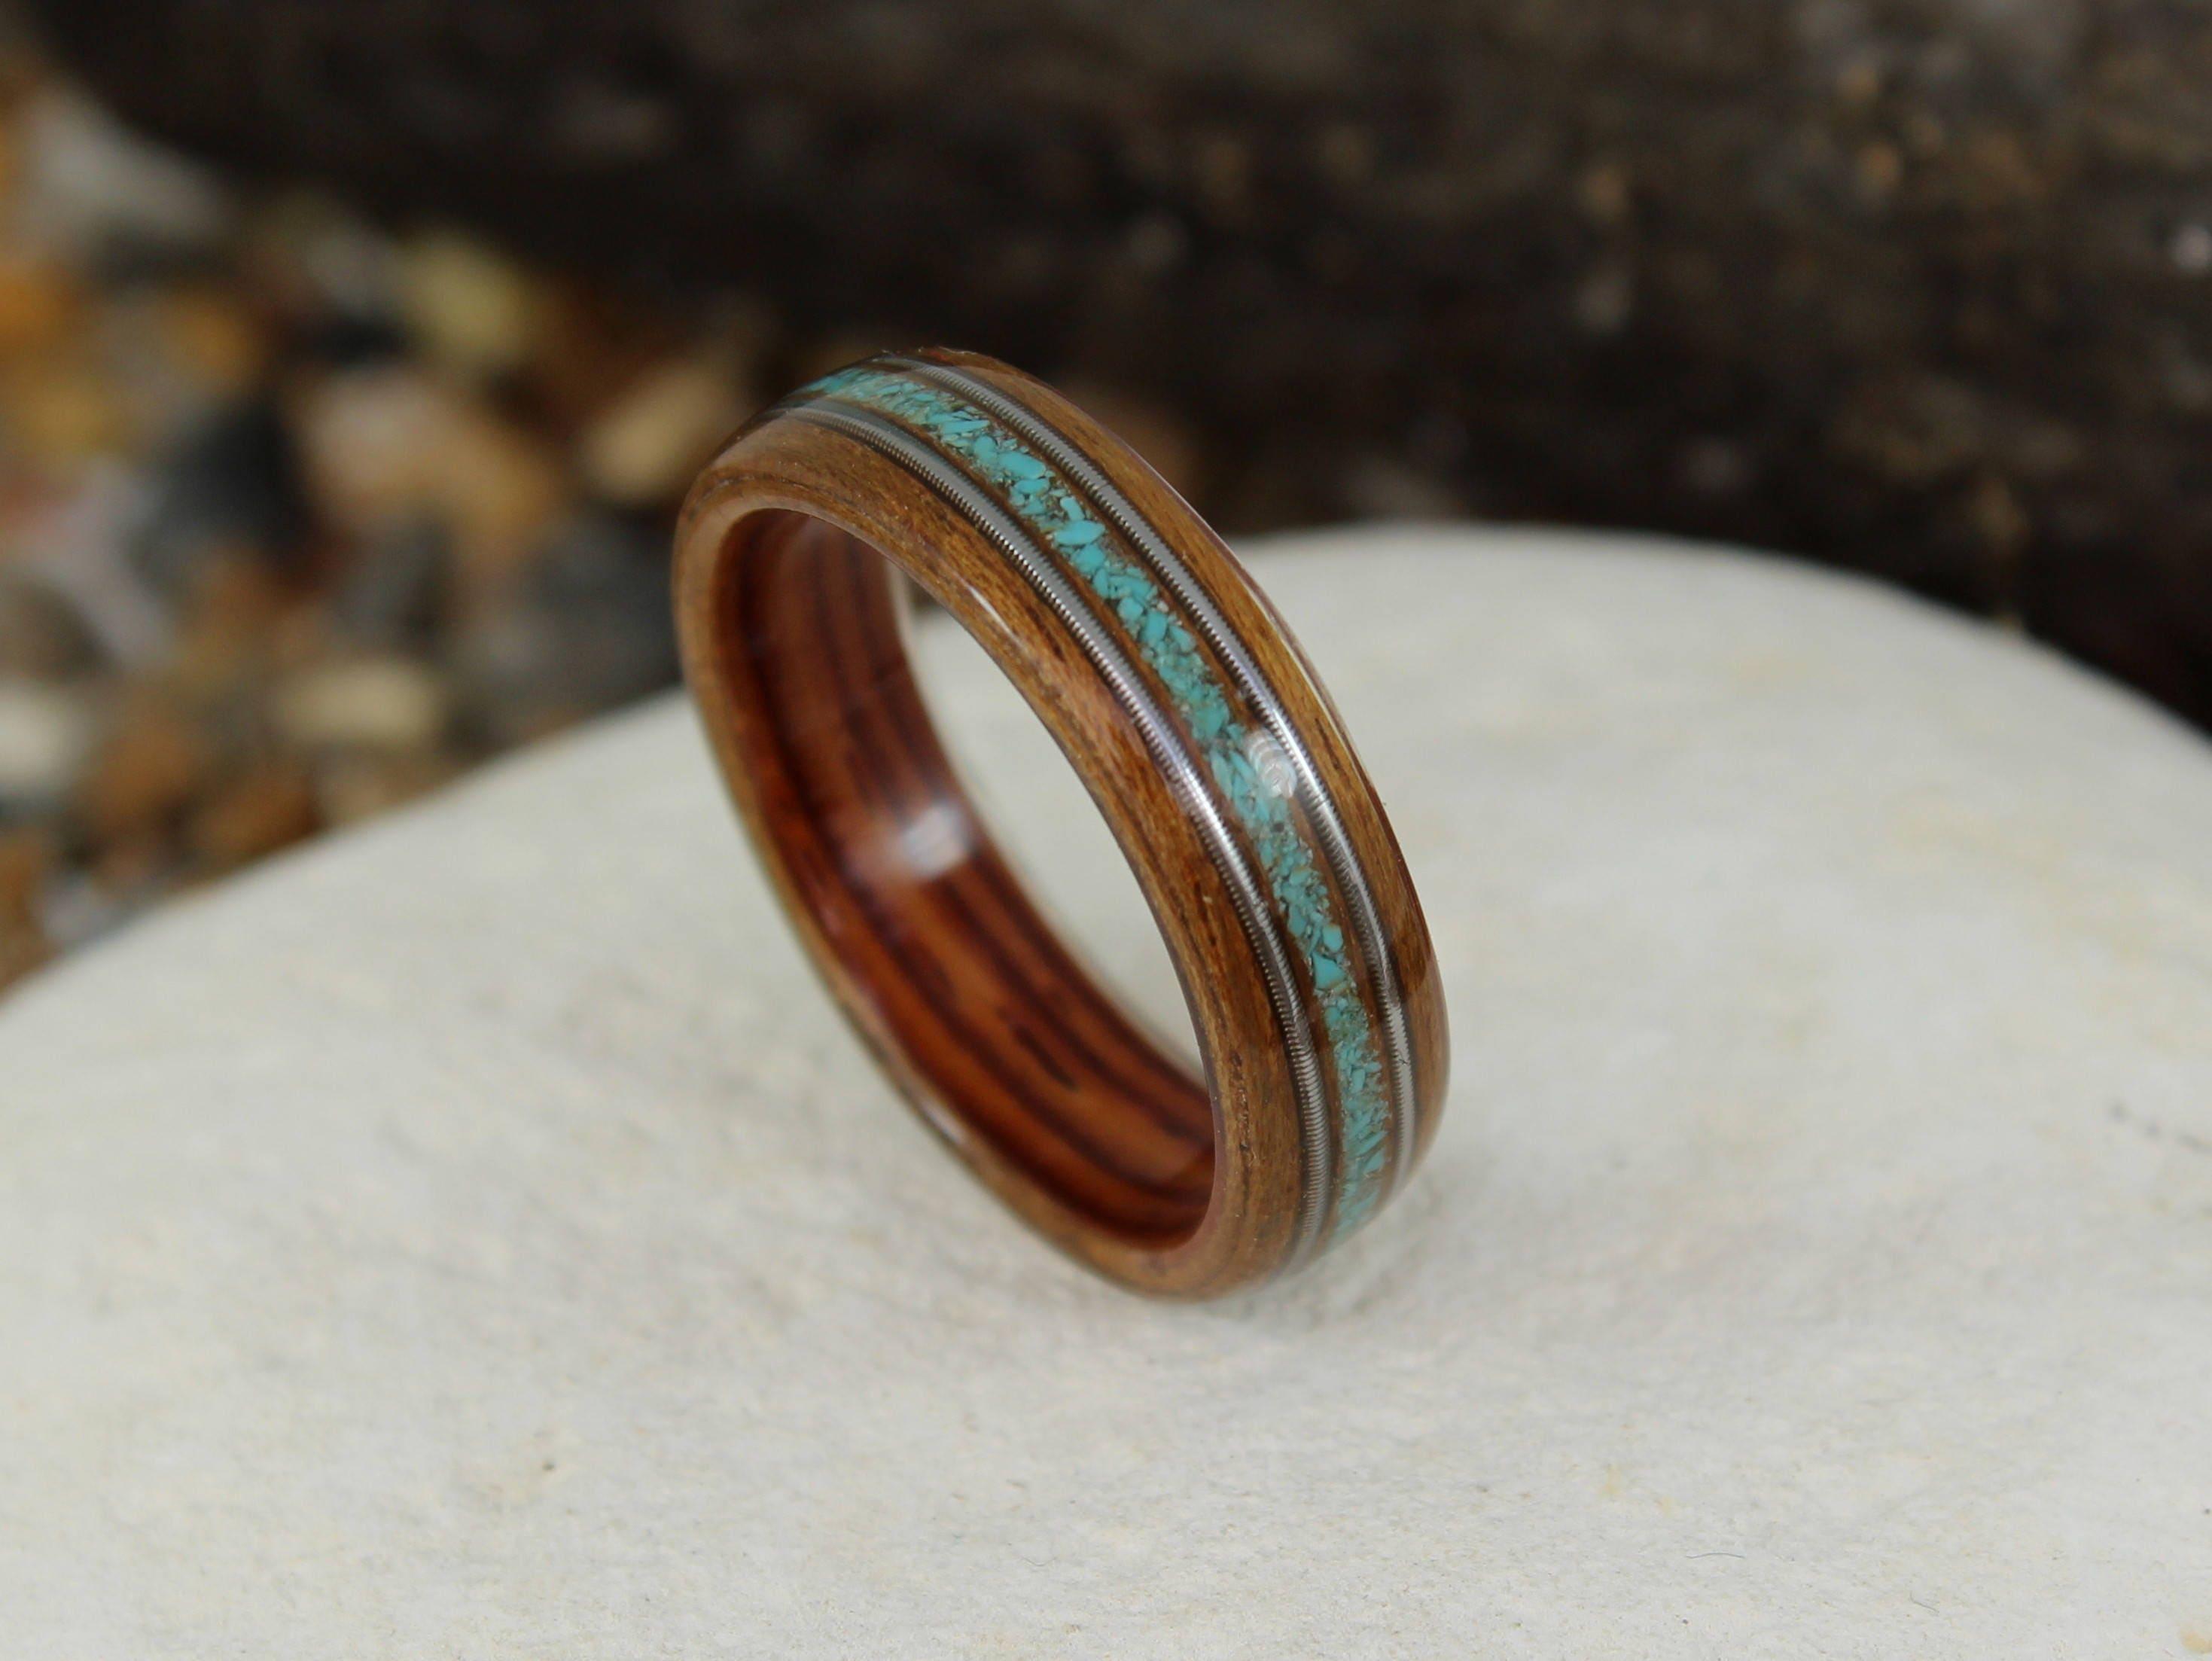 Wood Rings Wooden Rings Mens Wood Rings Wooden Wedding